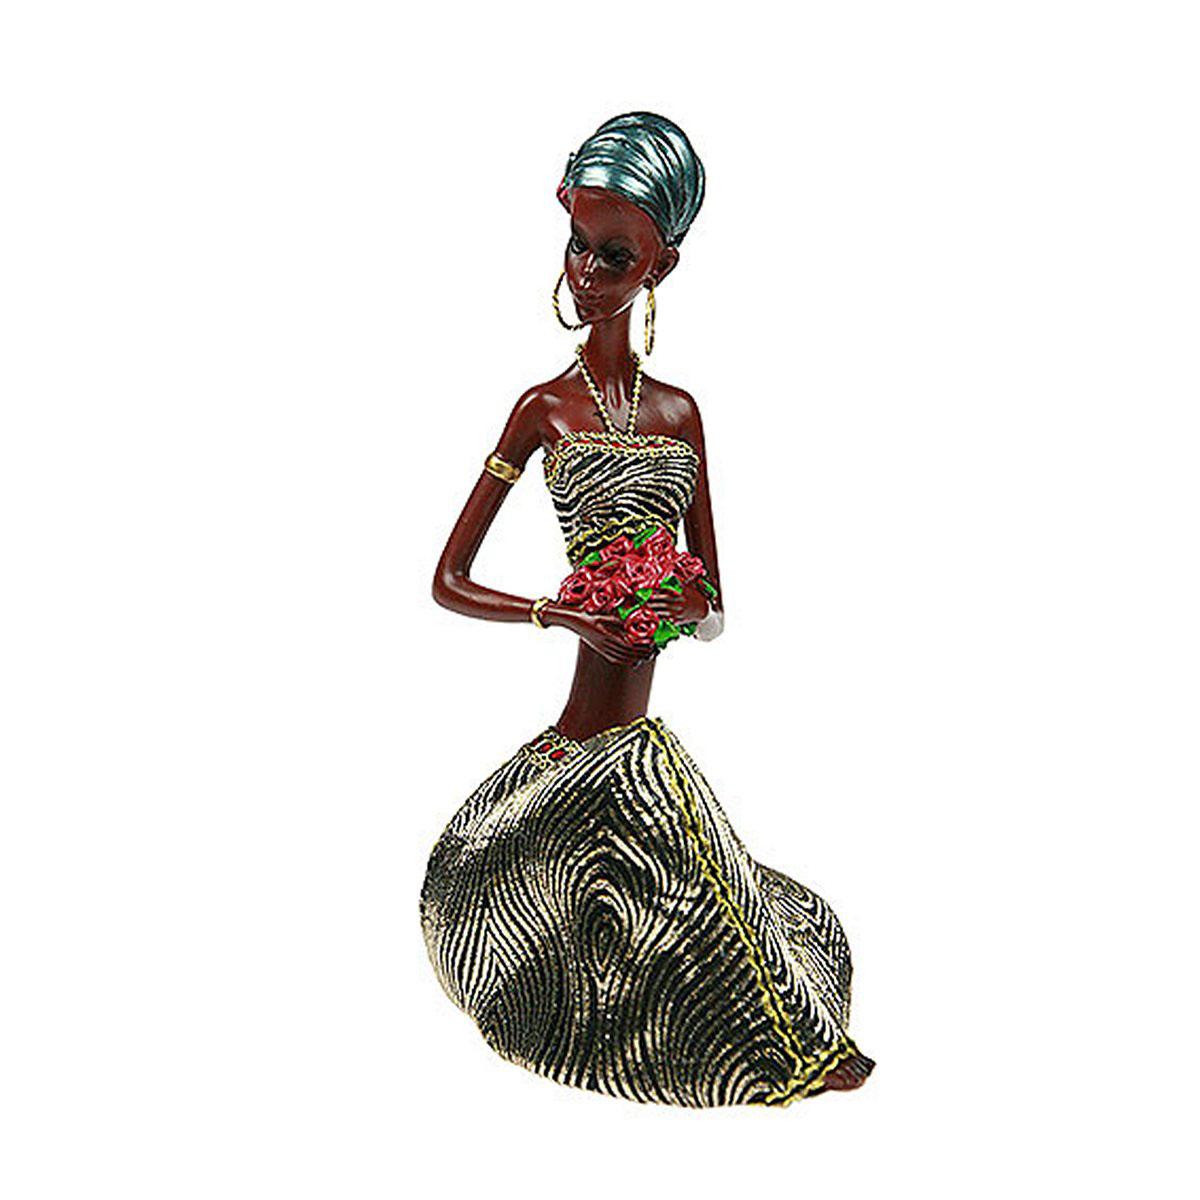 Статуэтка Русские Подарки Африканка, 11 х 15 х 24 см статуэтка русские подарки африканка 10 х 12 х 43 см